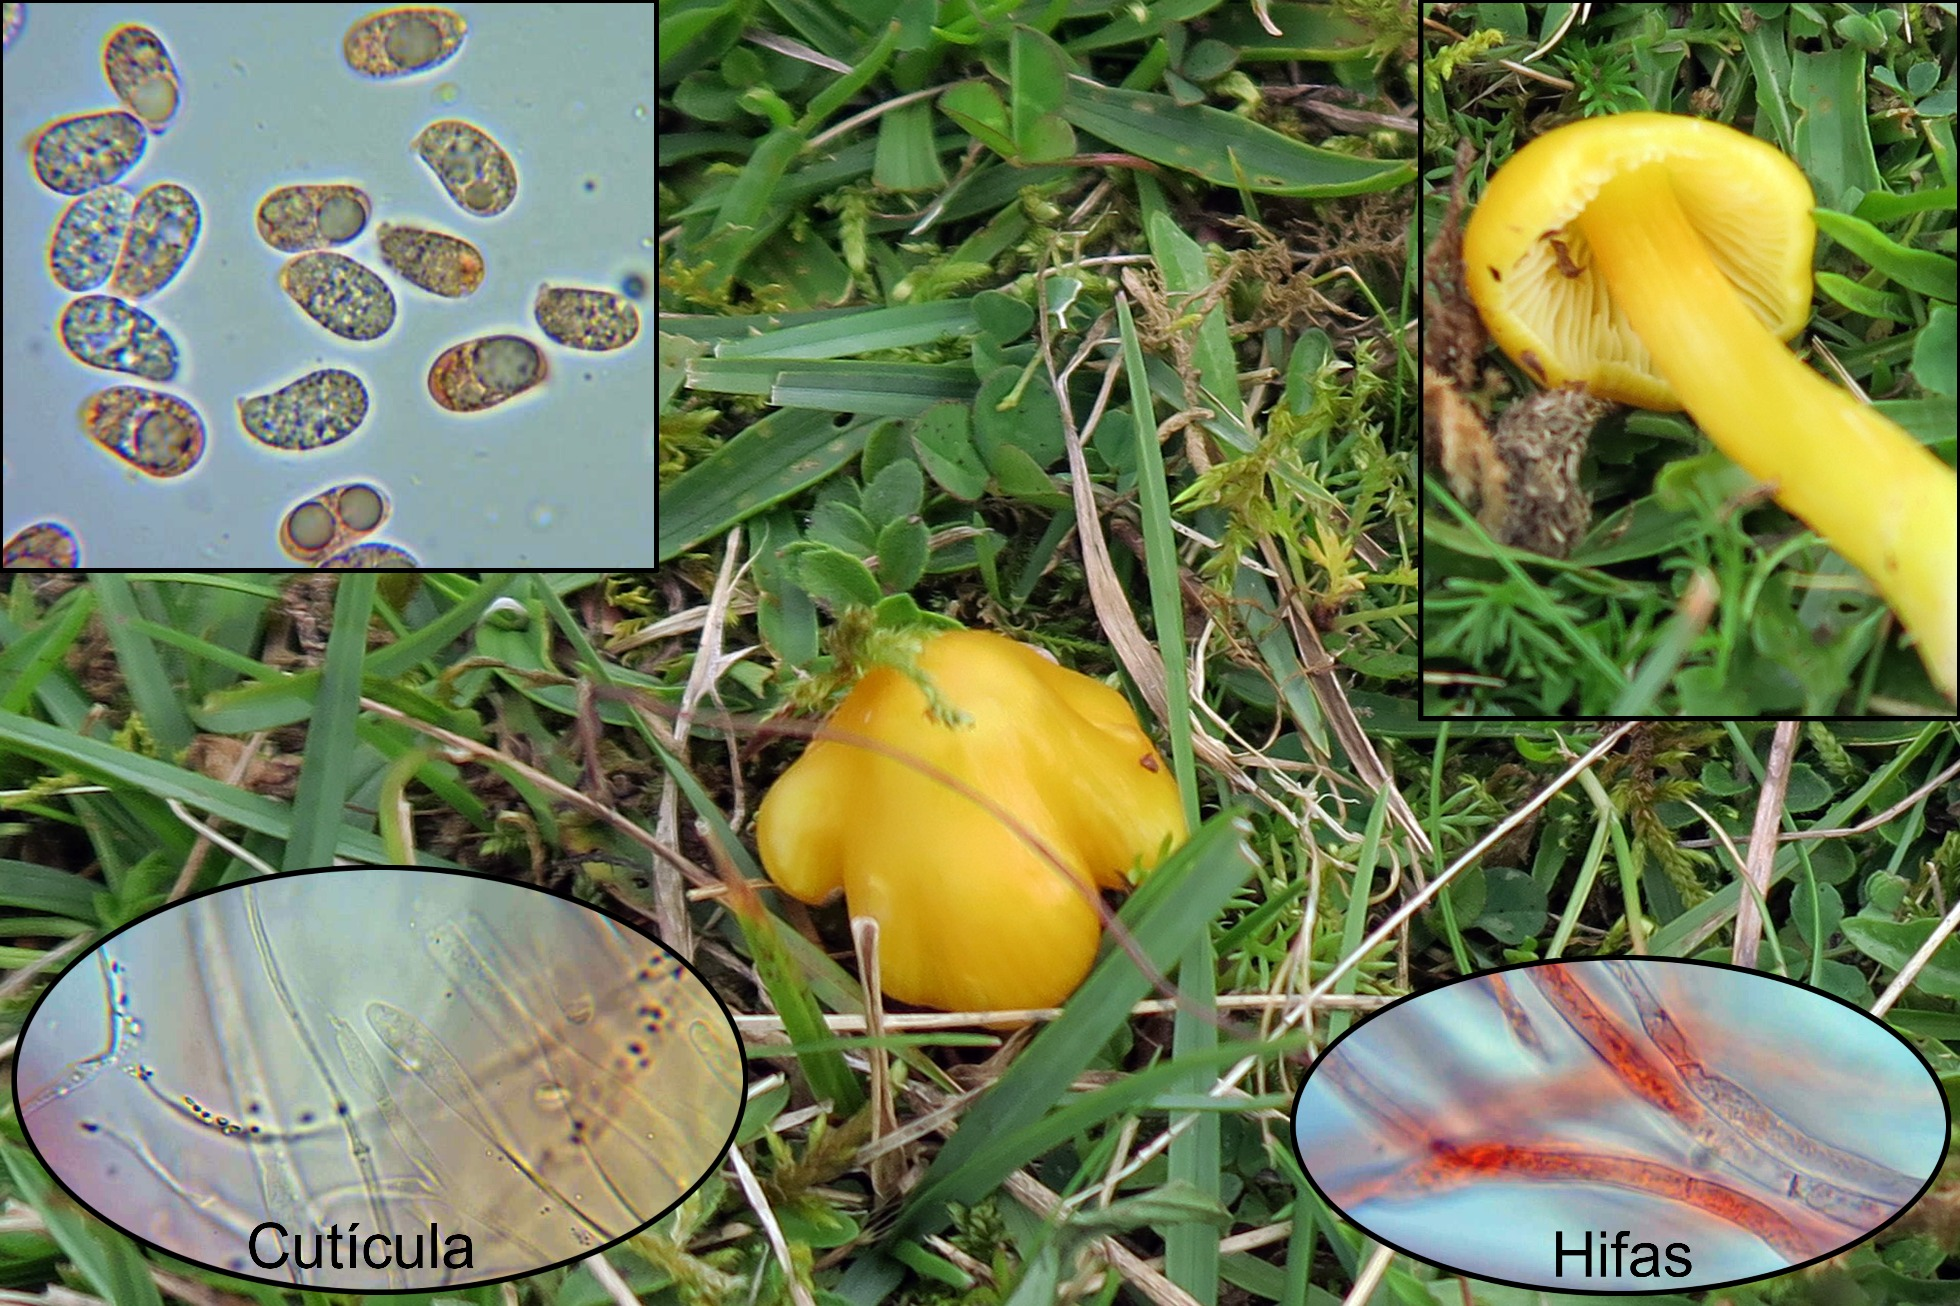 Hygrocybeacutoconica.jpg